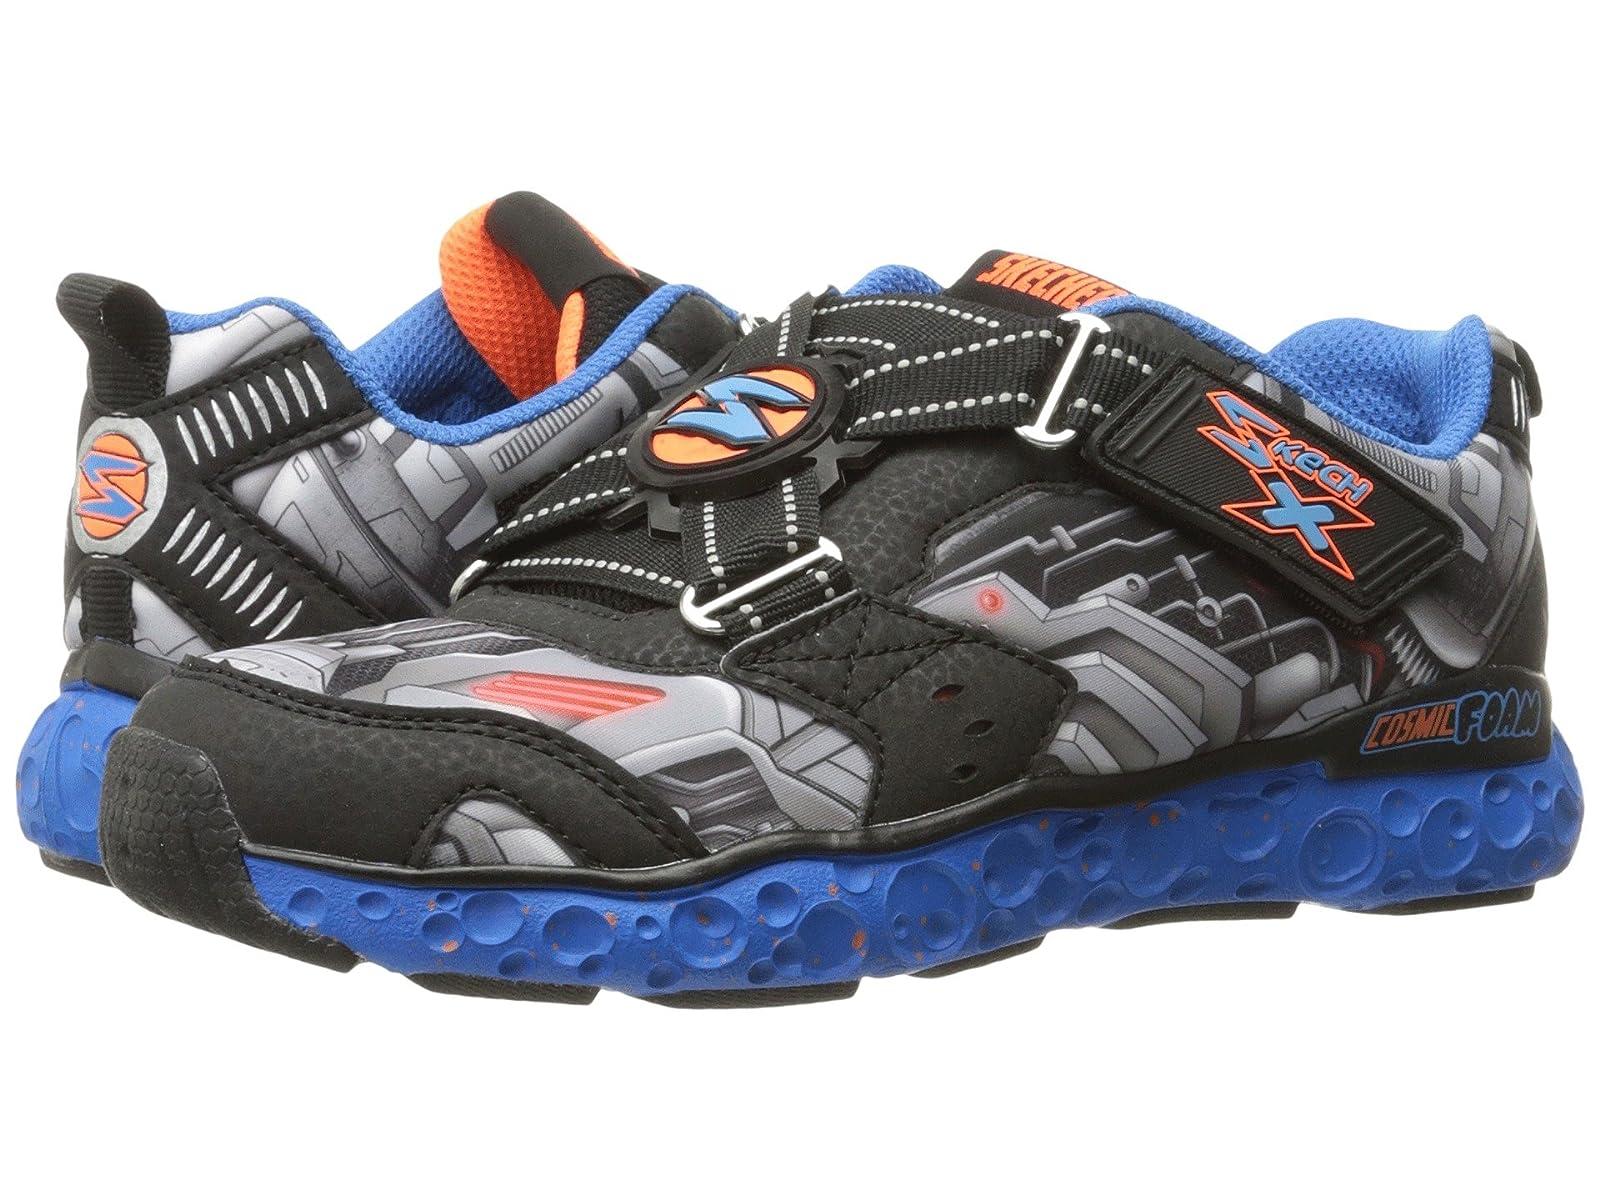 SKECHERS KIDS Cosmic Foam Portal X 97502L (Little Kid/Big Kid)Cheap and distinctive eye-catching shoes